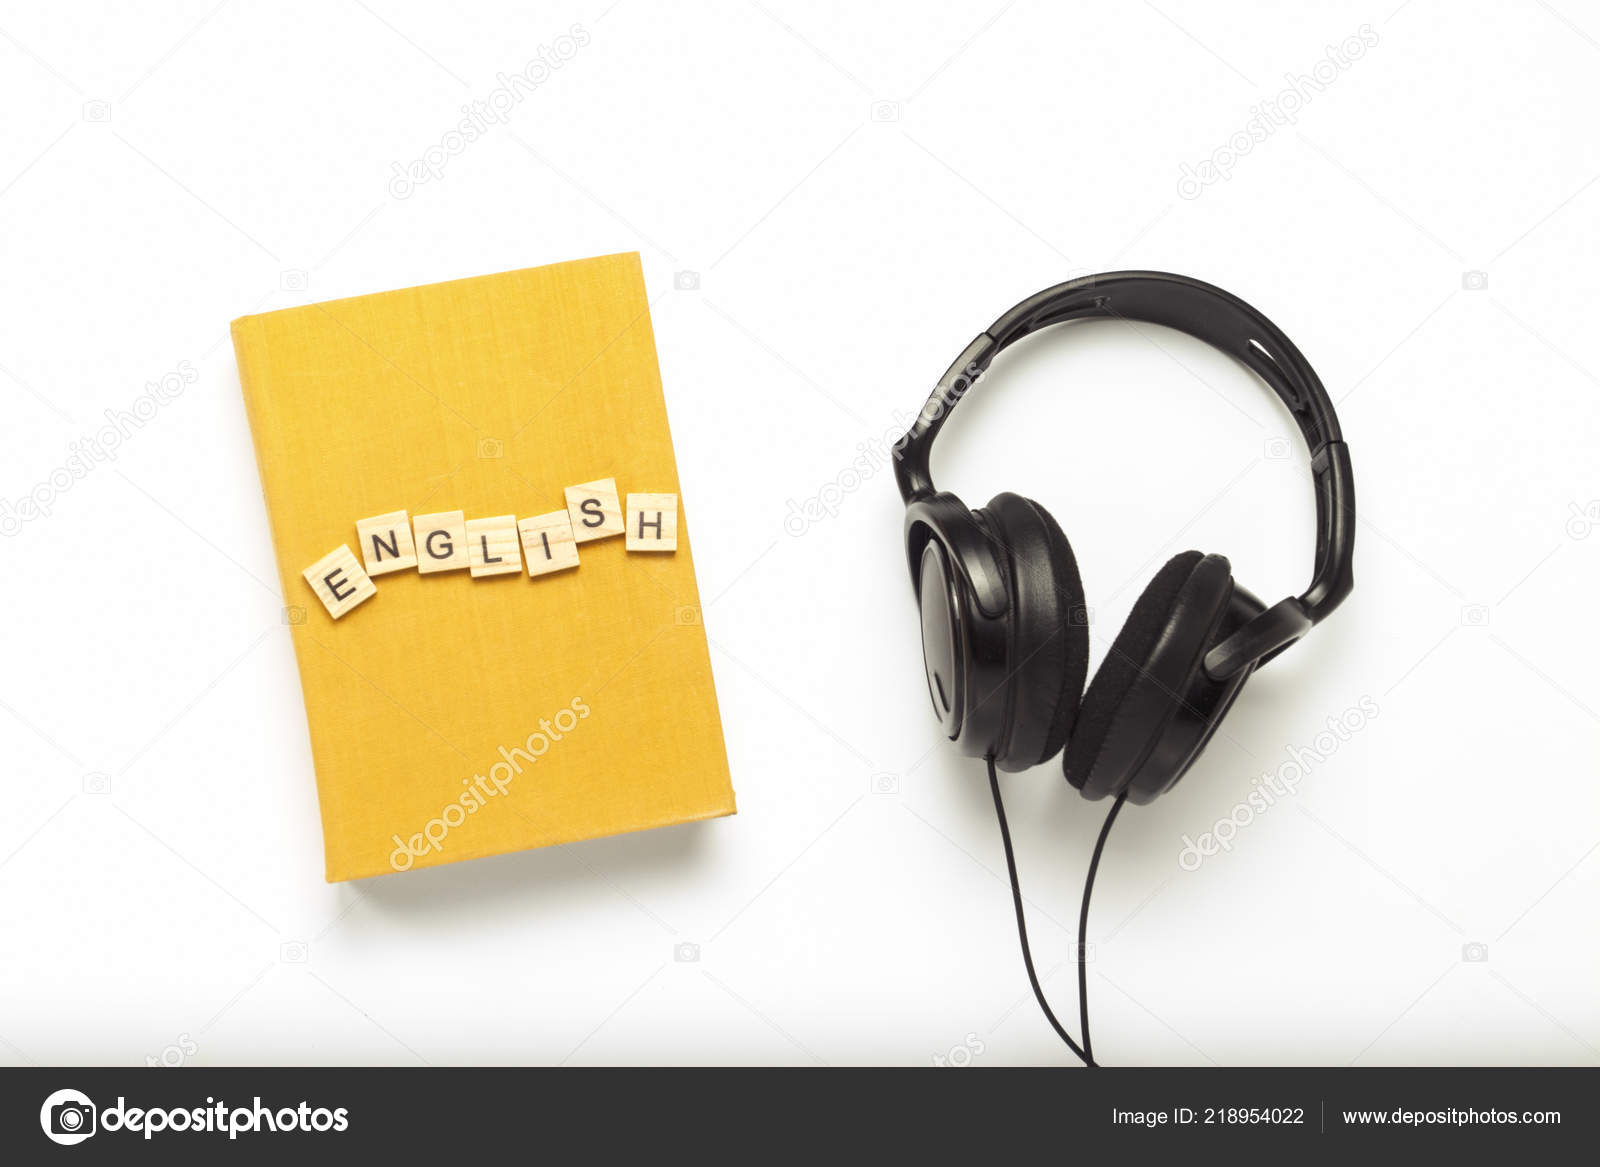 Book Yellow Cover Text English Black Headphones White